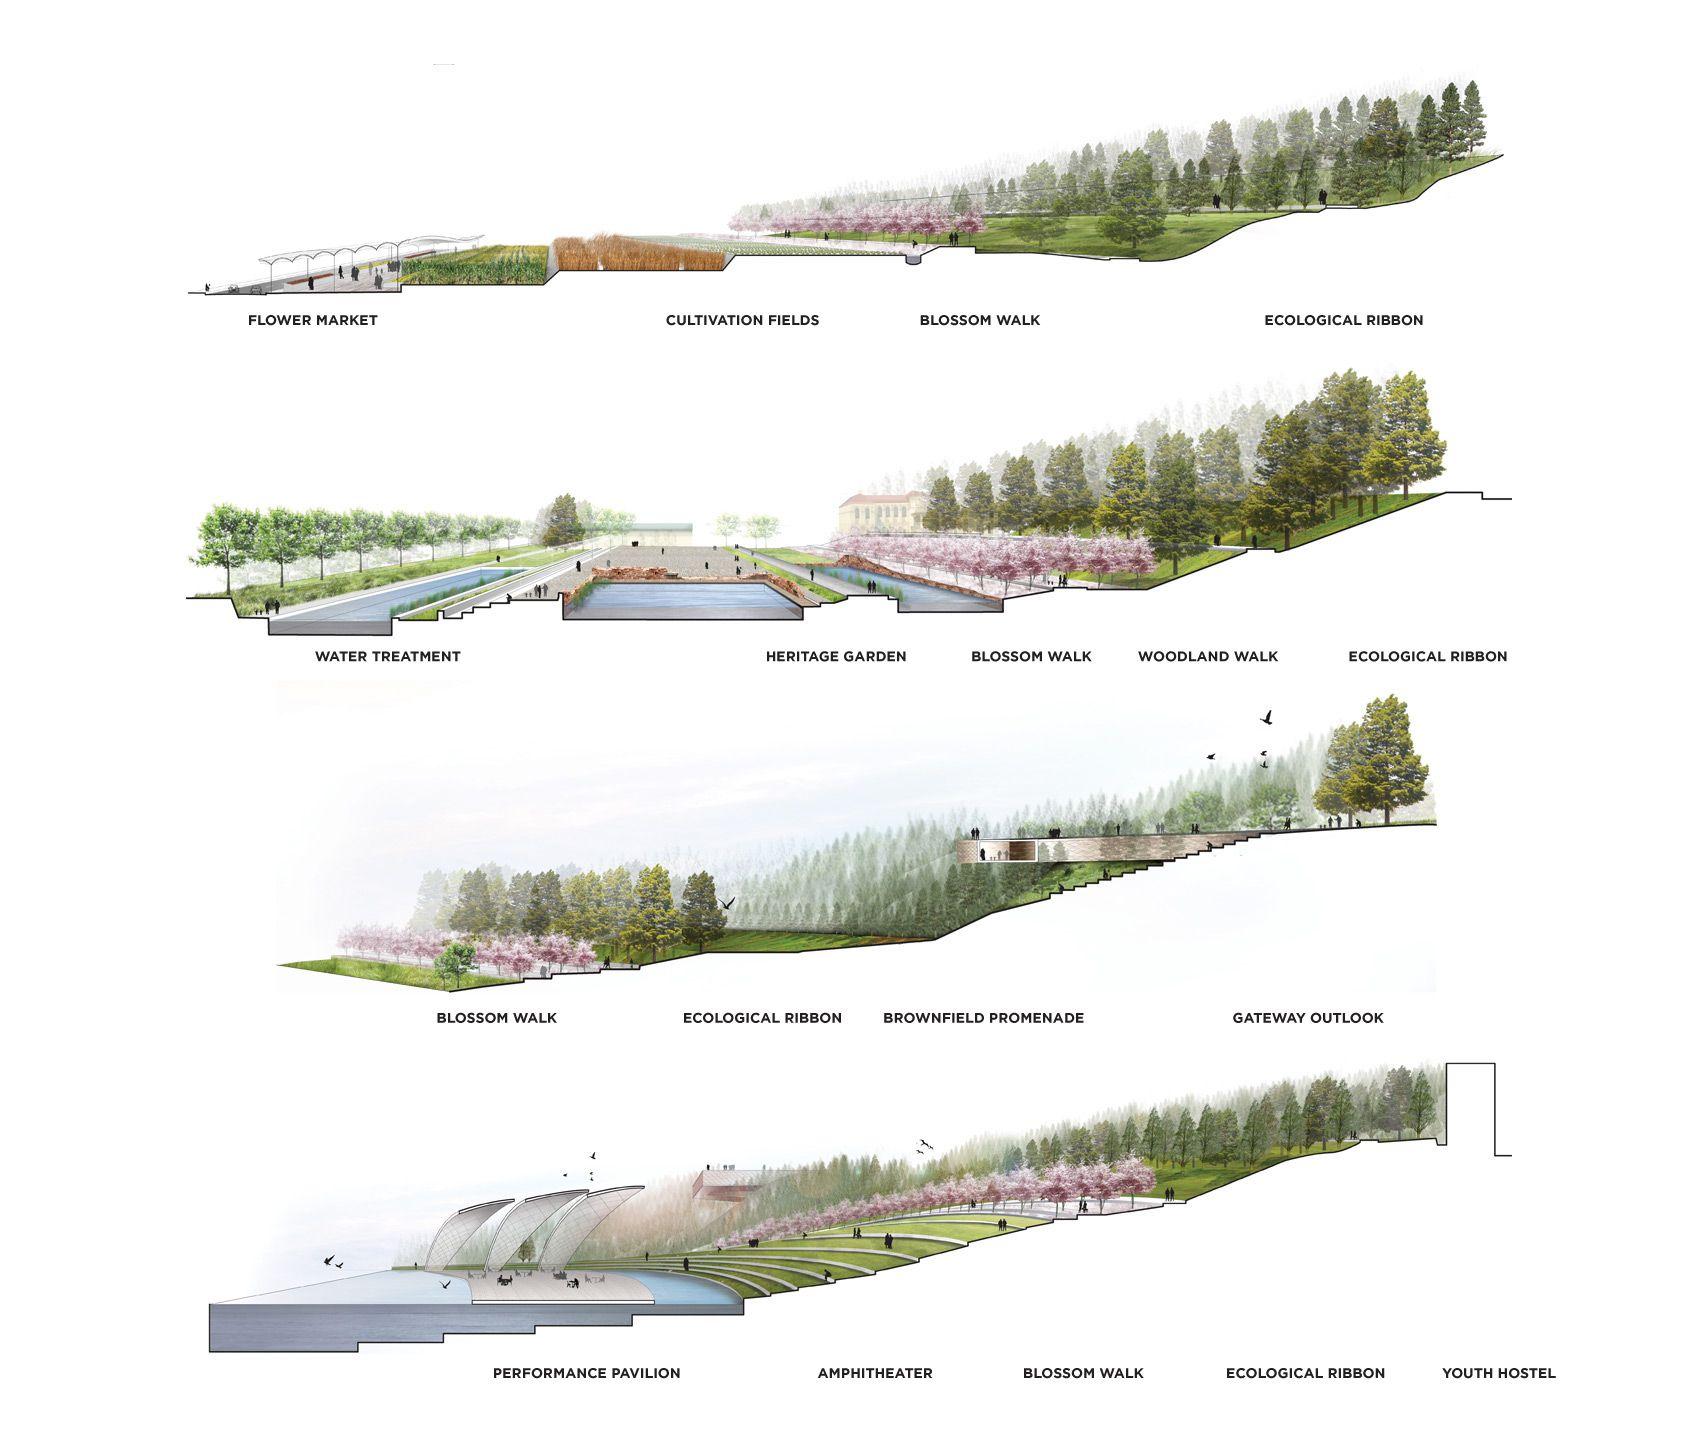 Sectional Perspectives Yongsan National Urban Park Master Plan Weiss Manfredi 조경설계 빗물정원 조경